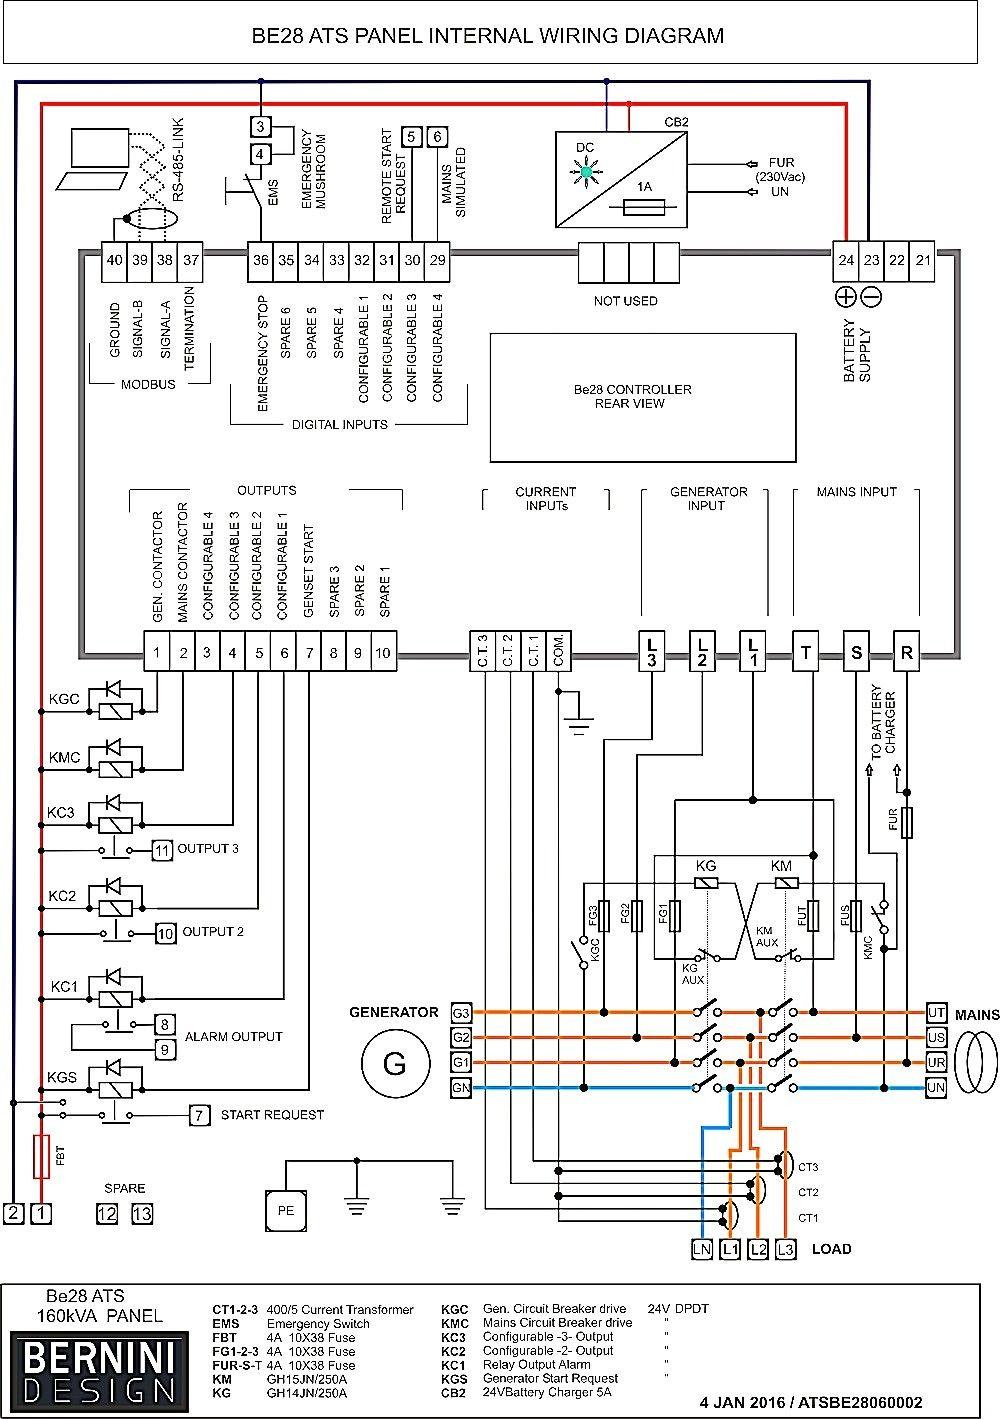 Transfer Switch Wiring Diagram Inspirational In 2020 Electrical Panel Wiring Transfer Switch Electrical Circuit Diagram